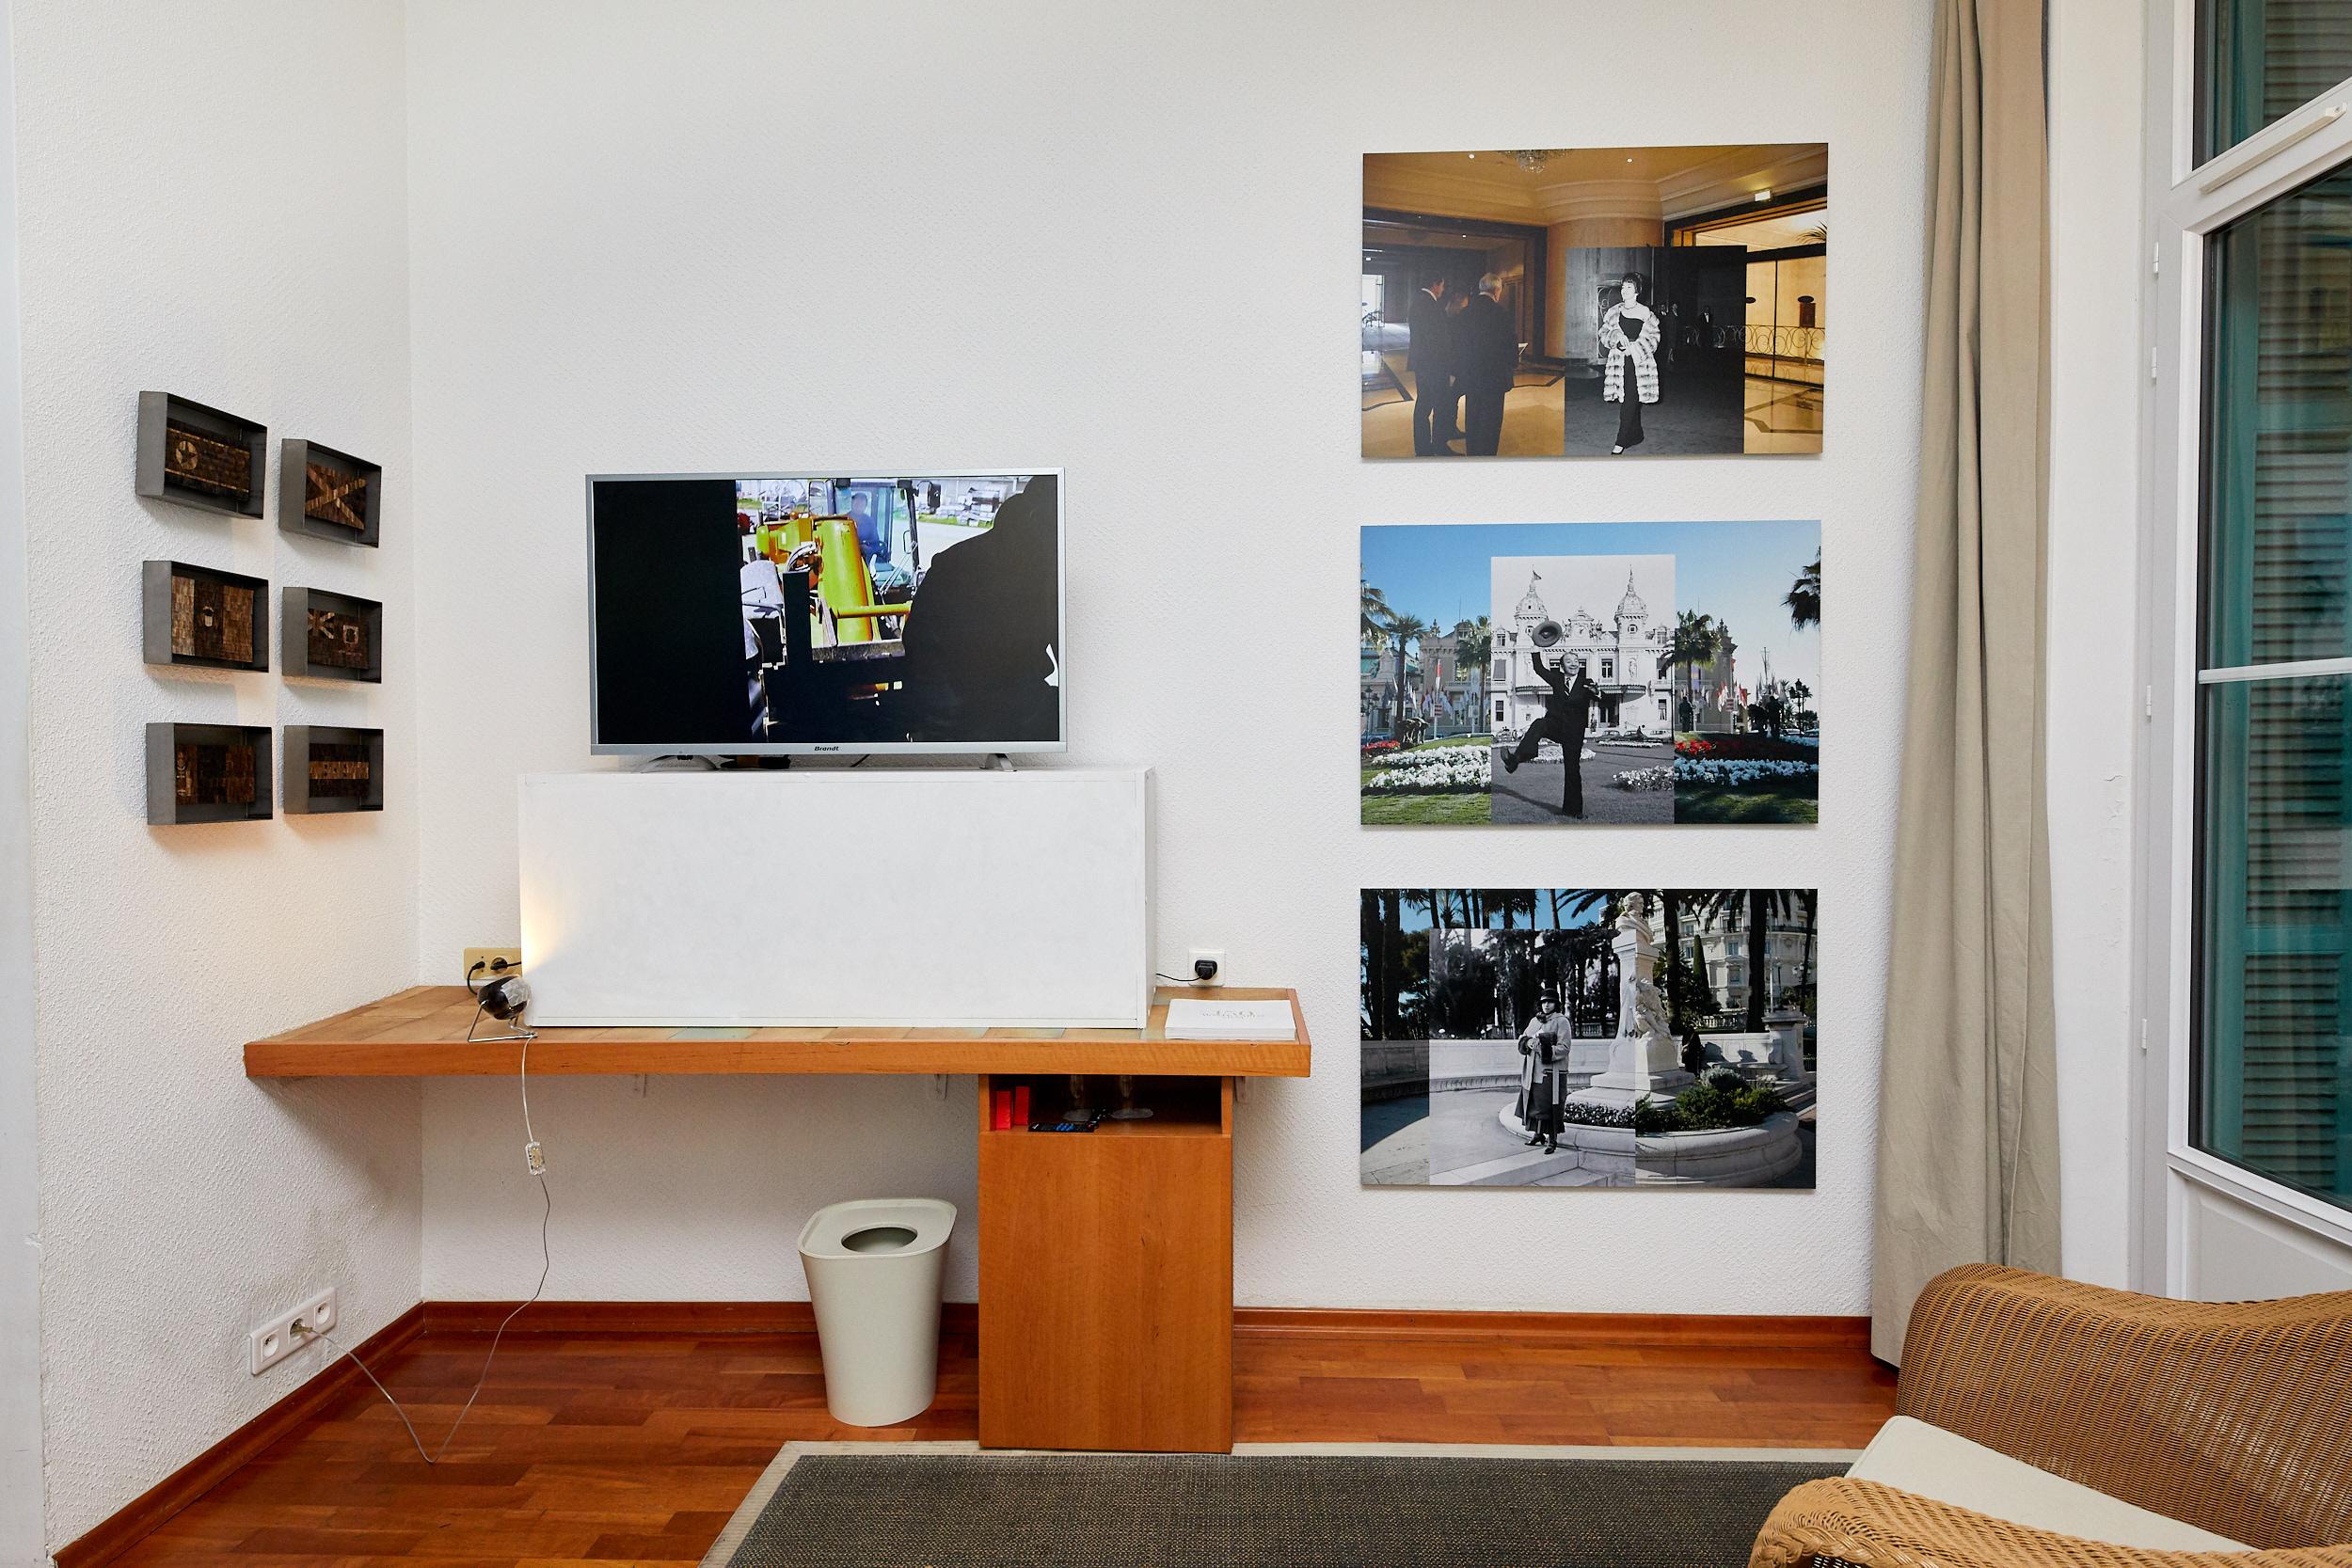 Bertille Bak, Galerie The Gallery Apart, 2019, camera camera, windsor